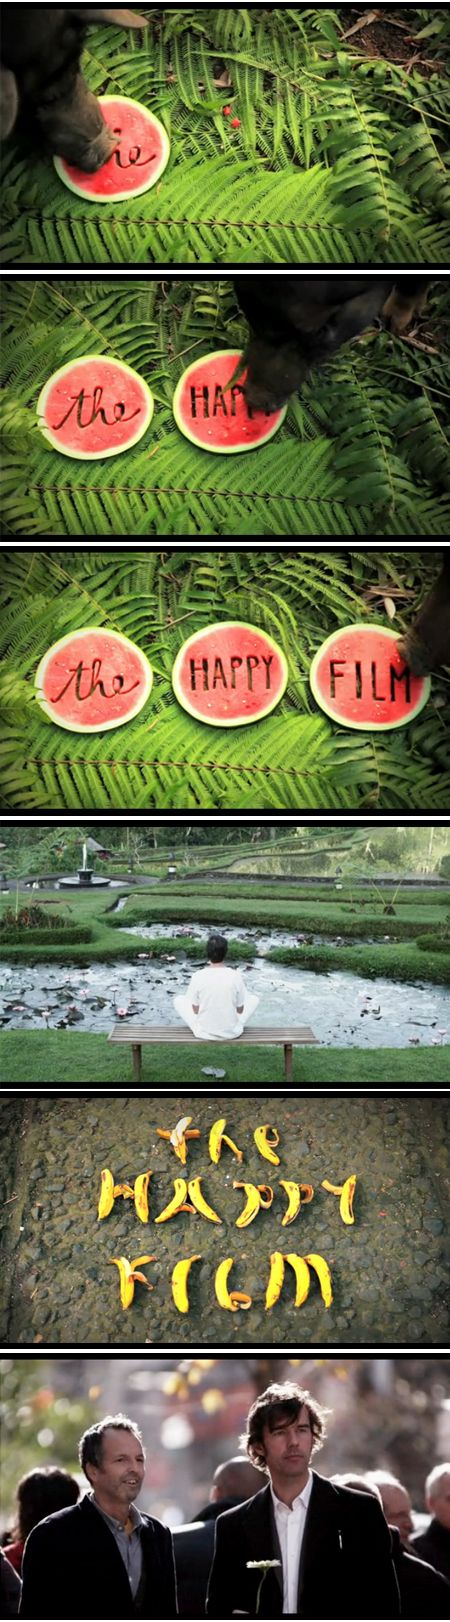 """the happy film"" by stefan sagmeister"